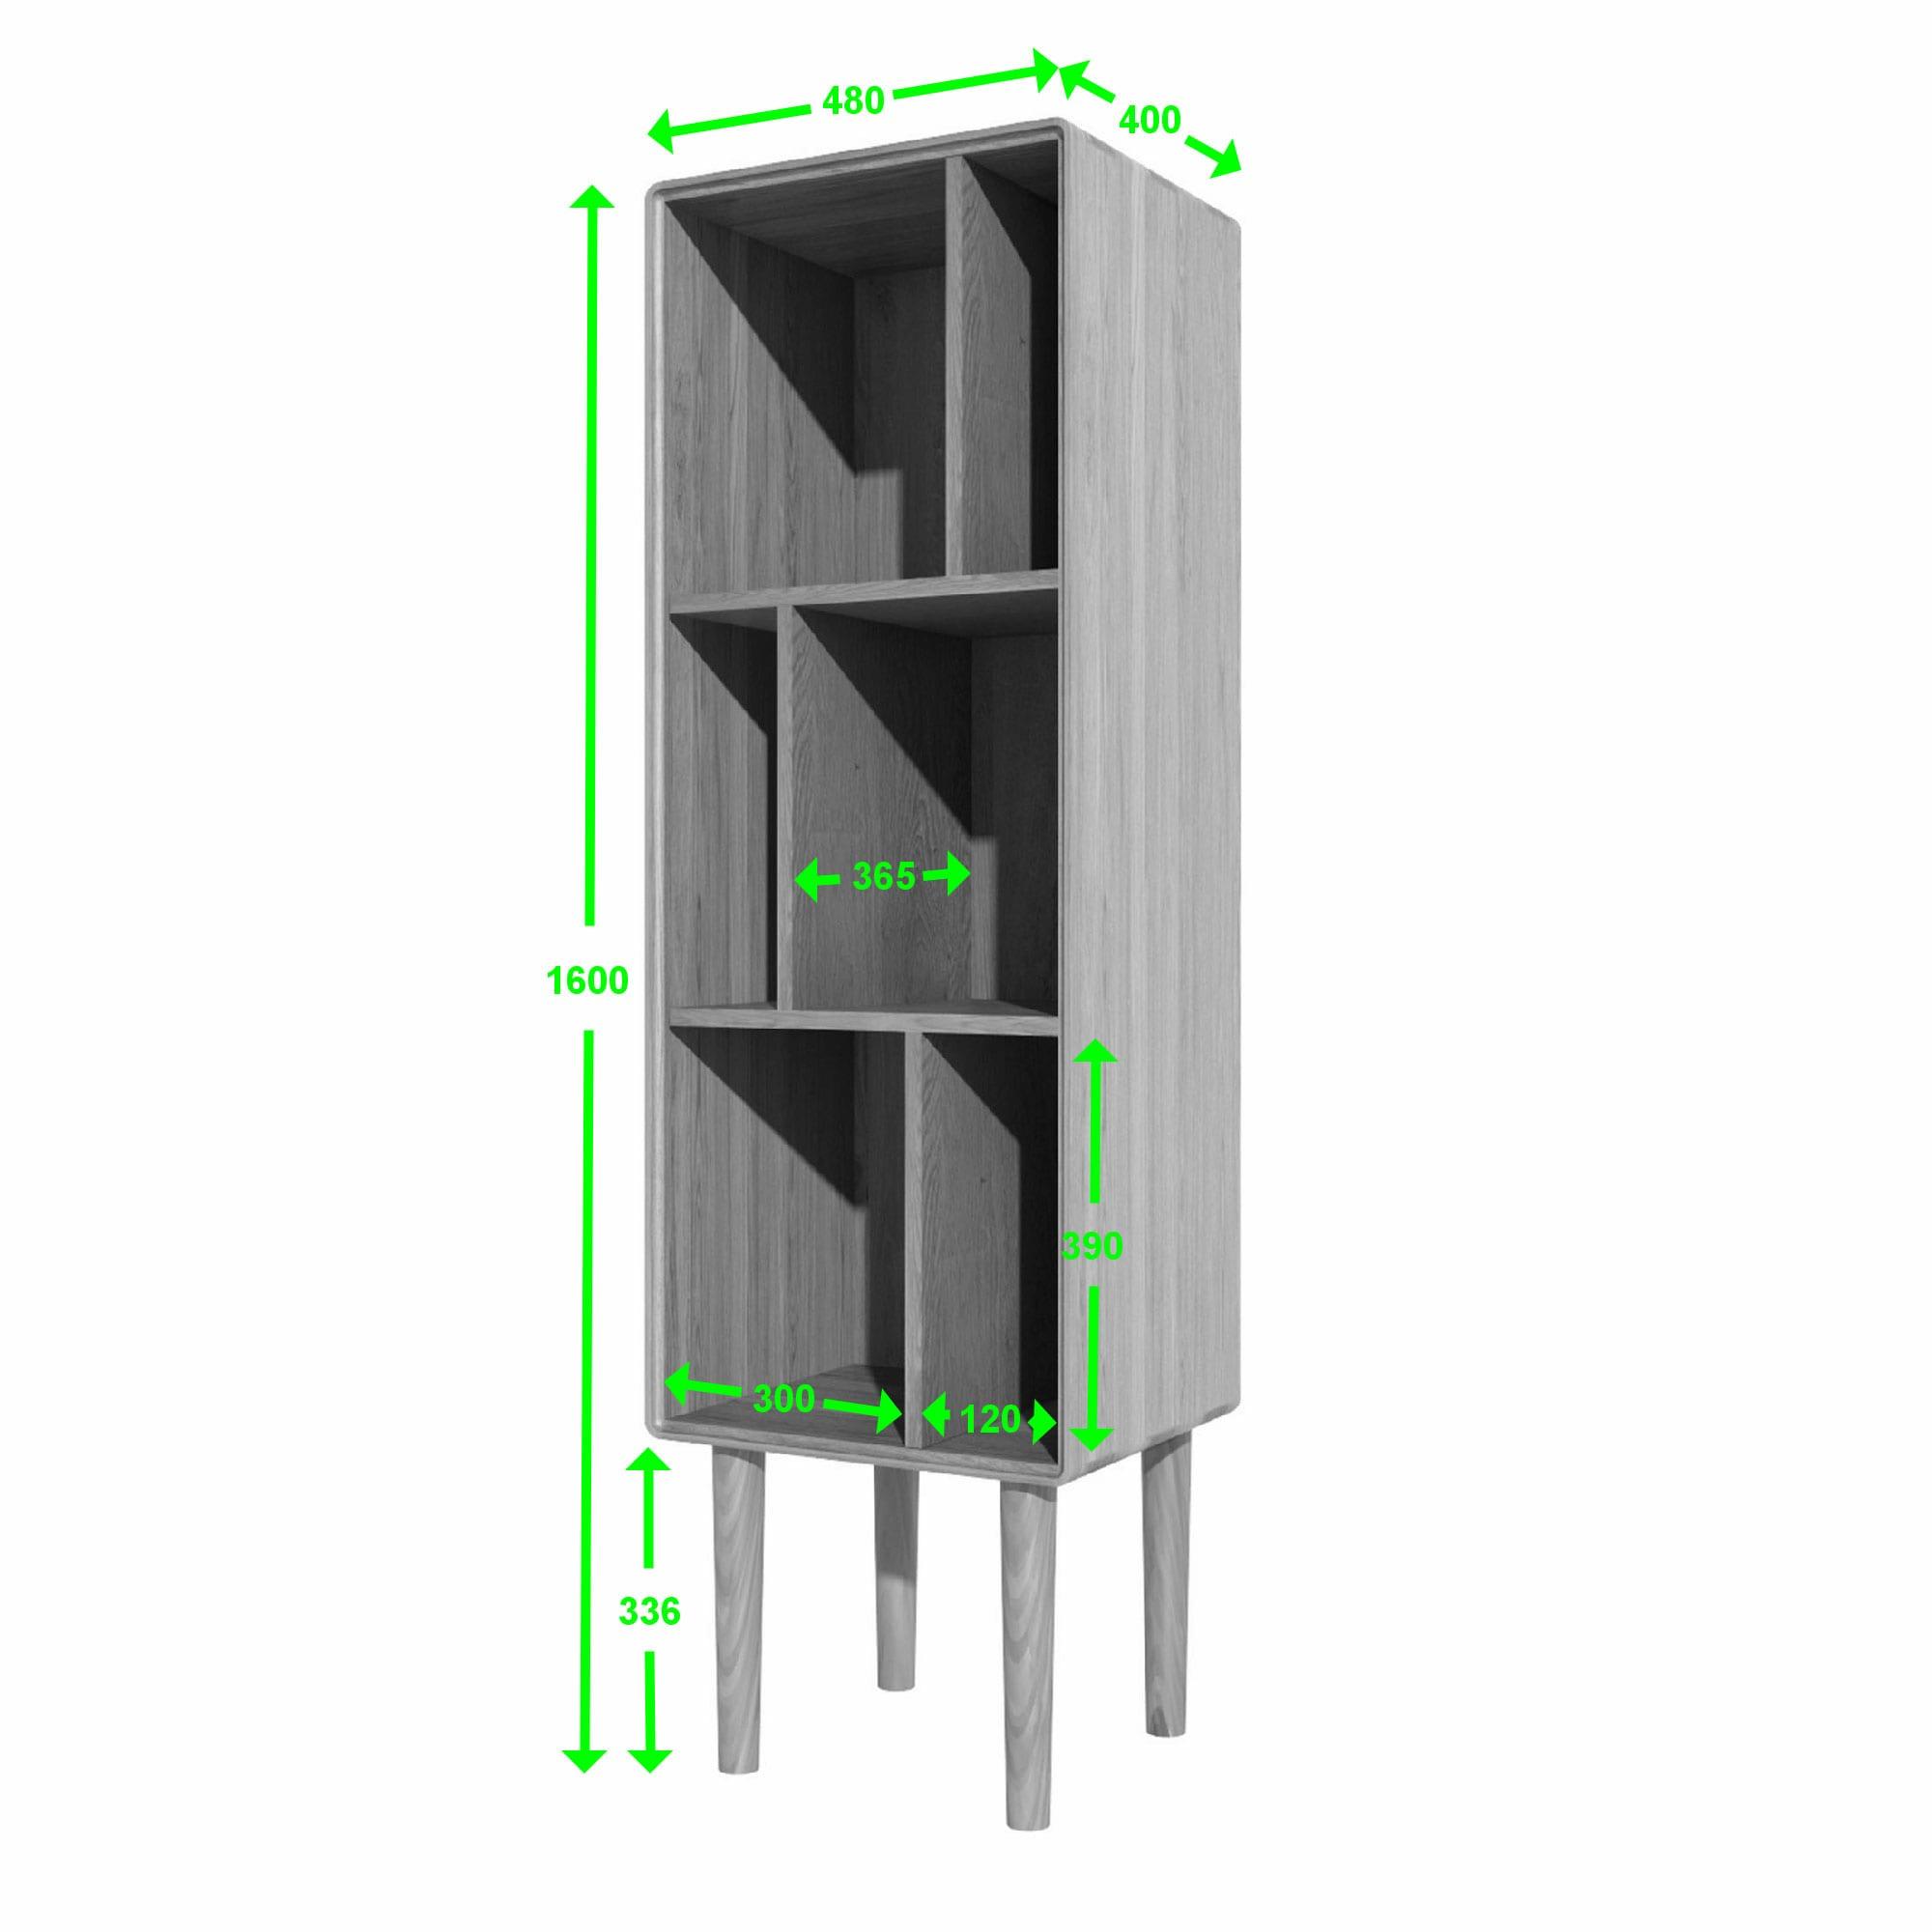 SCANC Scandic oak narrow cabinet measurements